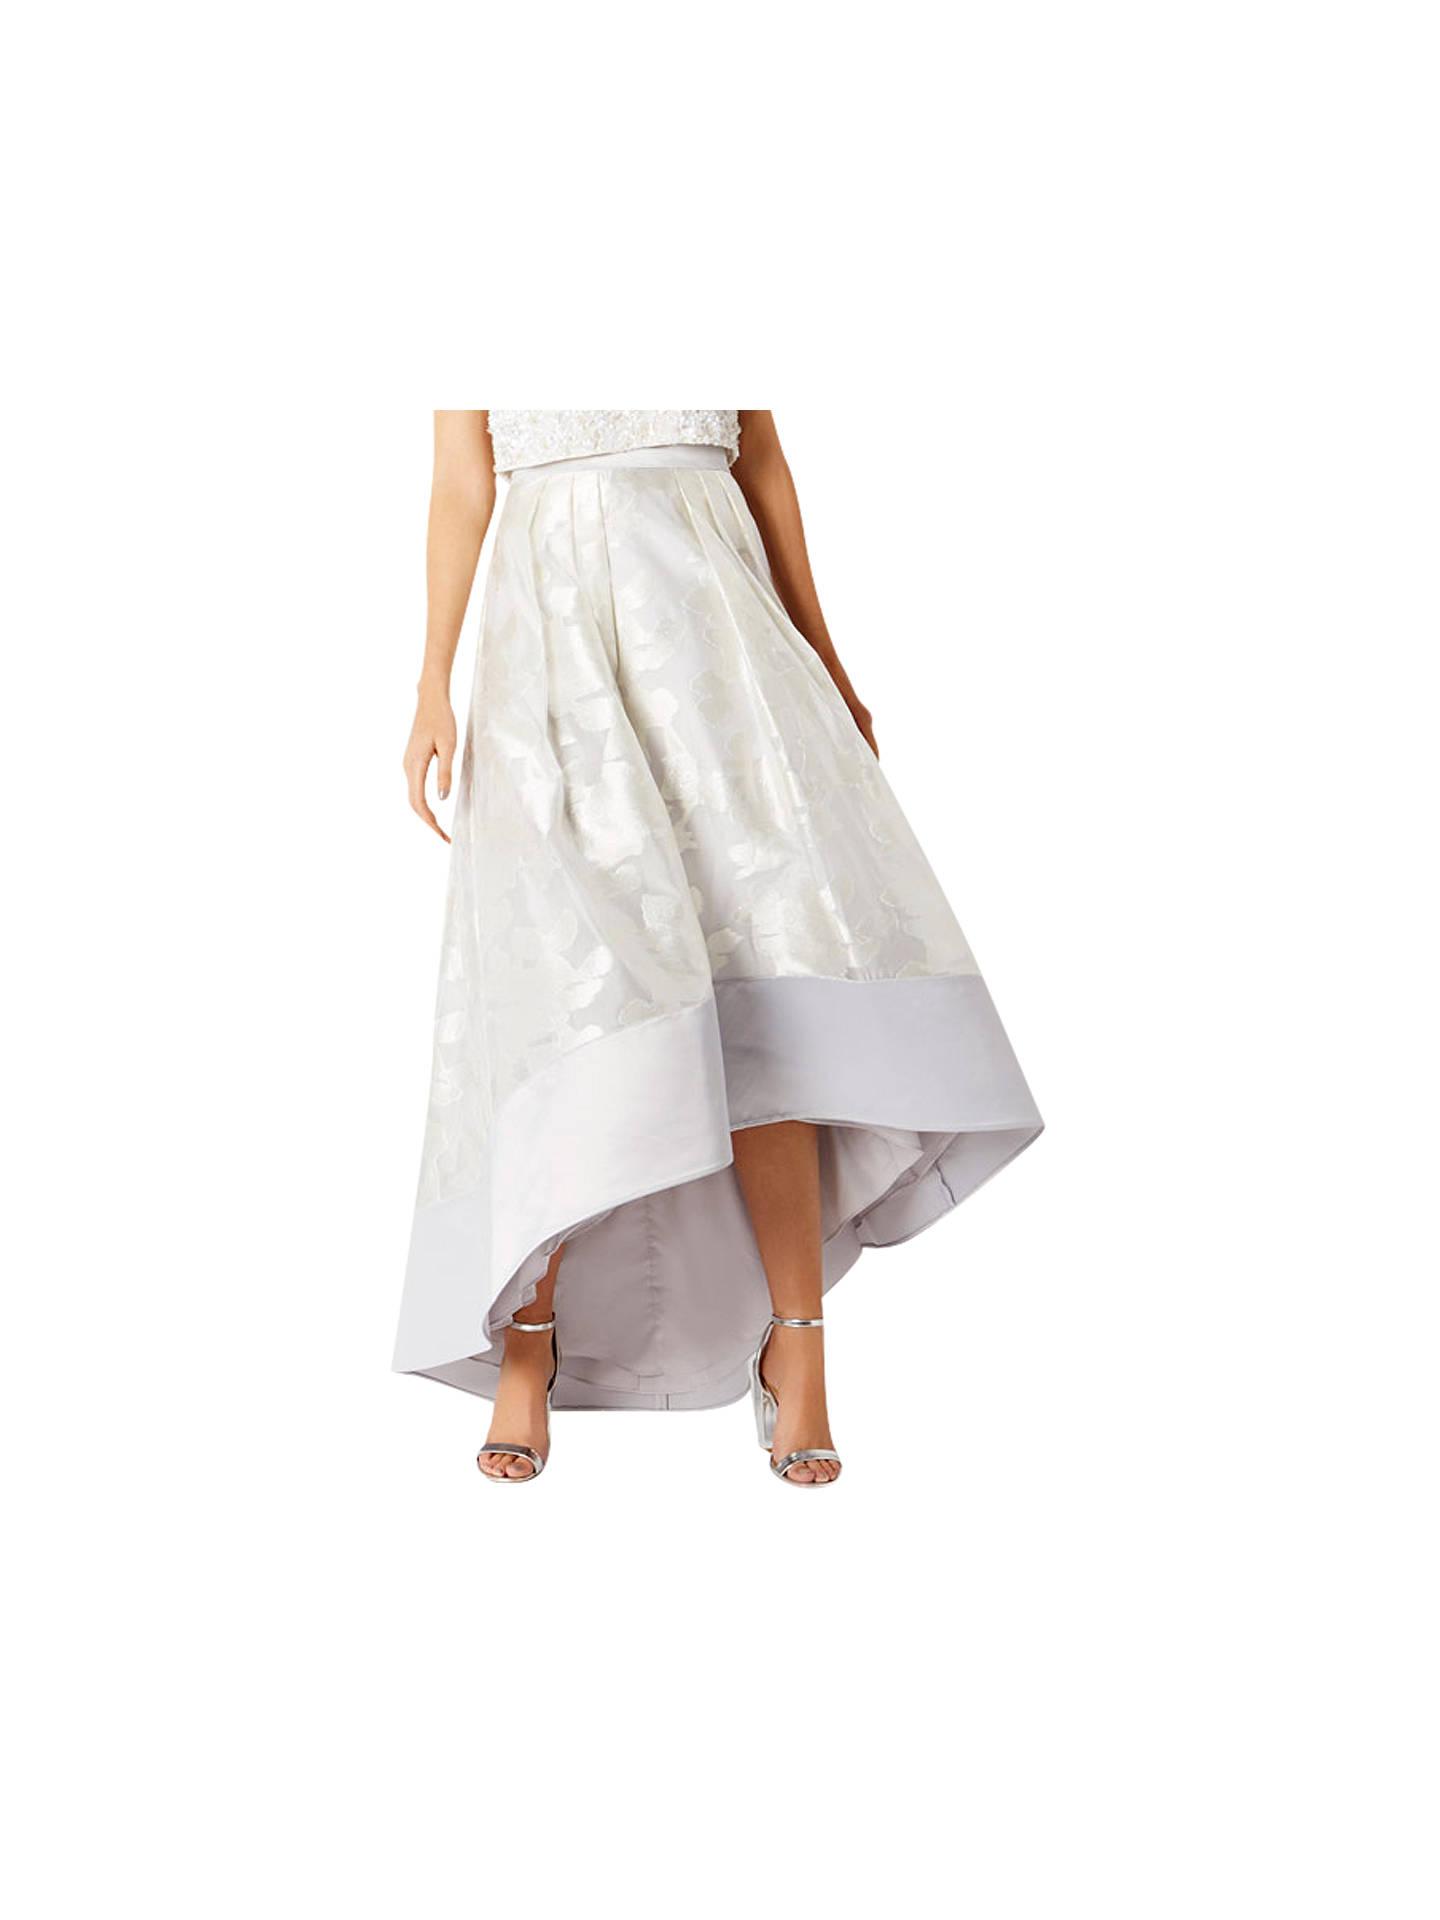 514815ef5 Buy Coast Flower Rhian Skirt, Silver, 6 Online at johnlewis.com